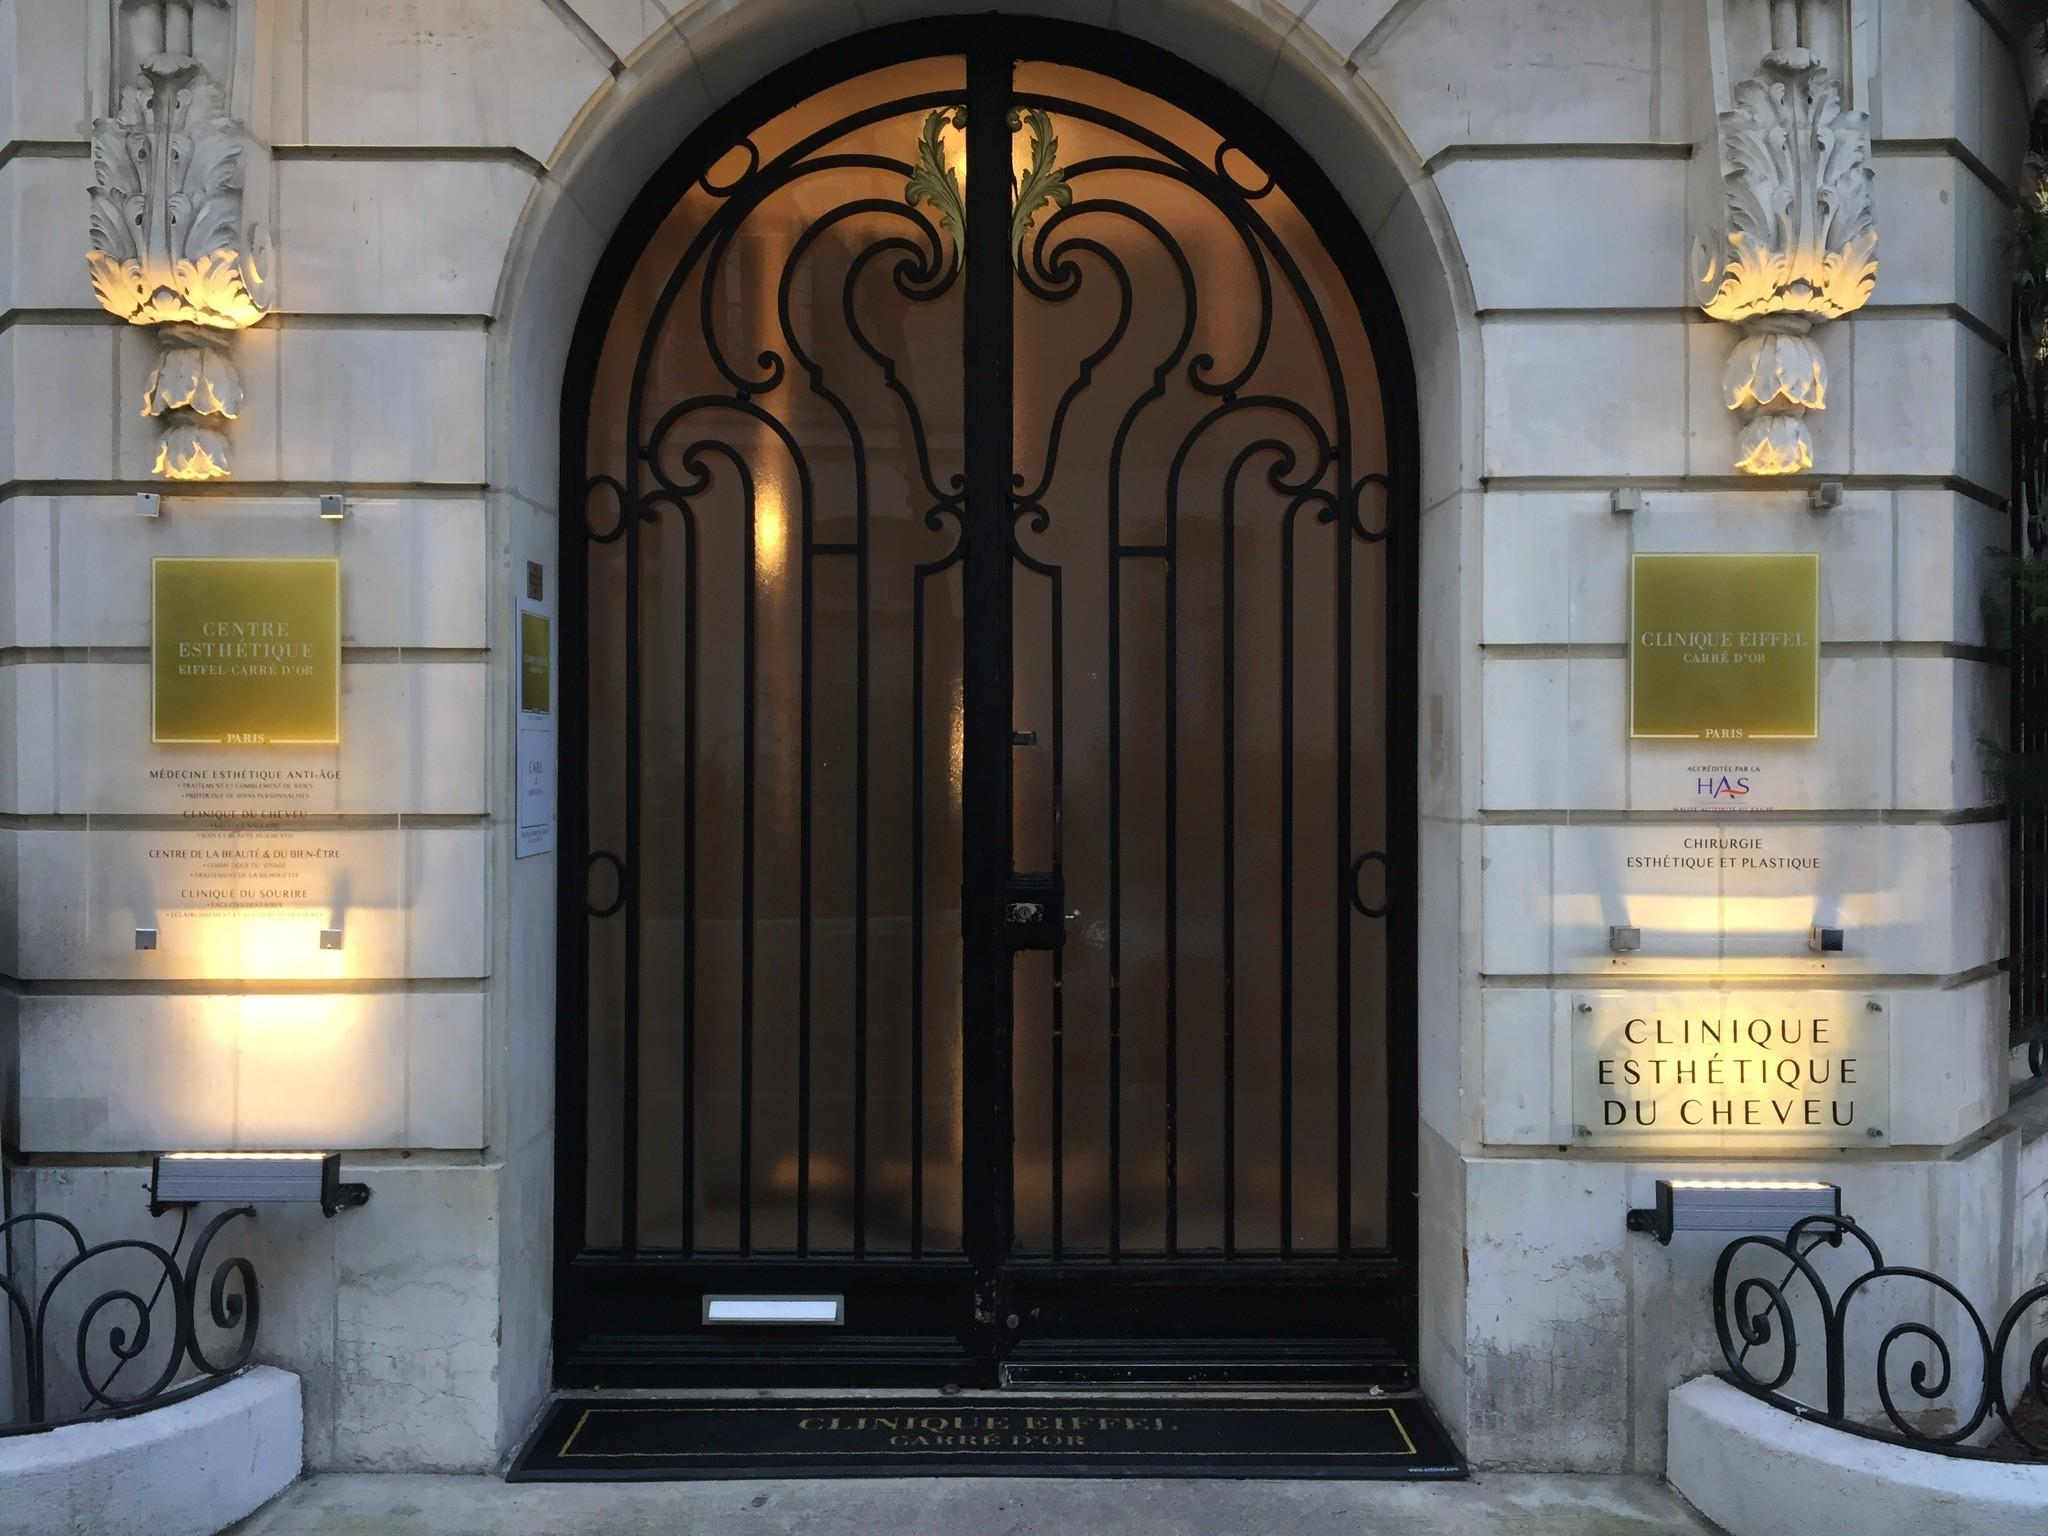 Clinique Eiffel Carre D Or Linkedin